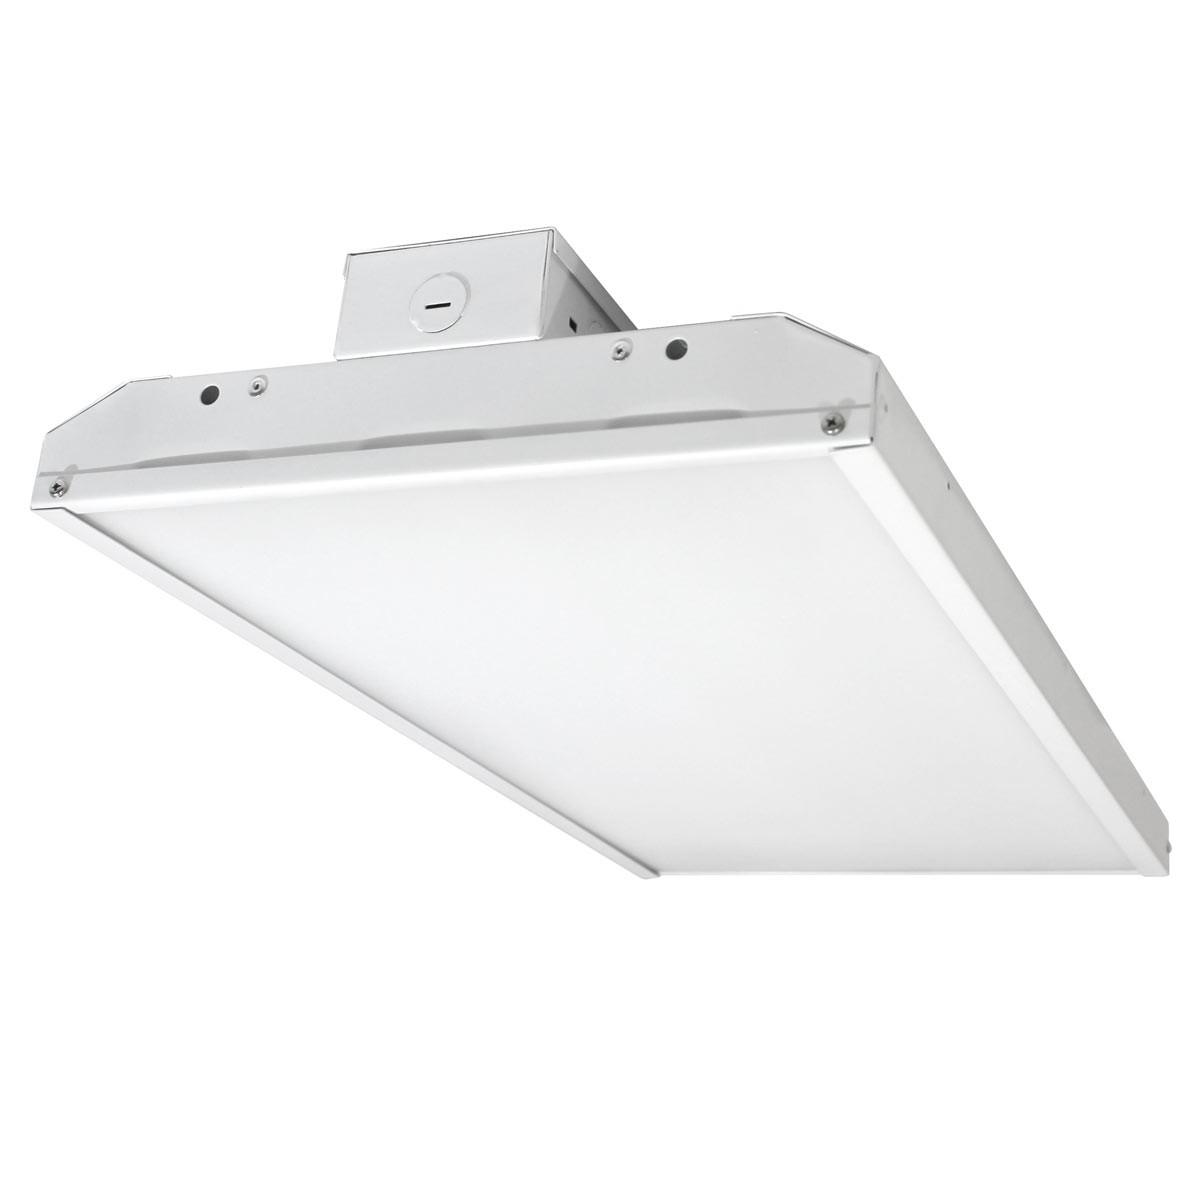 Low Bay Linear Led Lights: LED Linear High Bay TL-LHB2™ SERIES